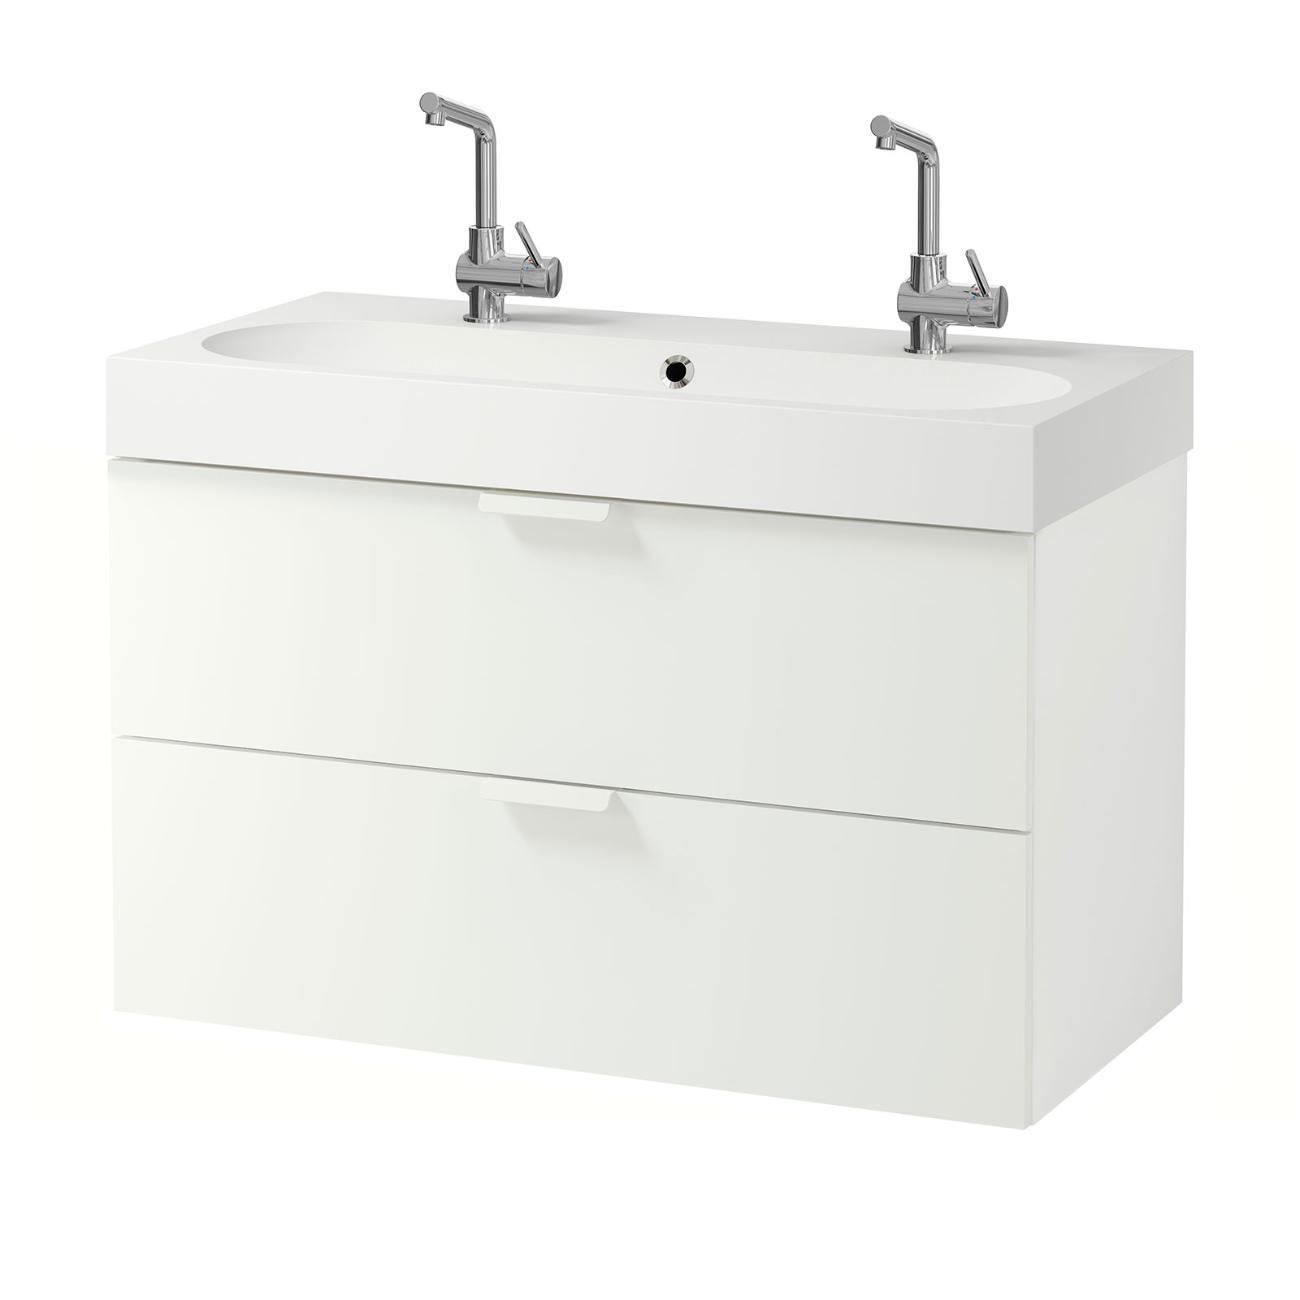 stylish bathroom vanities under 500